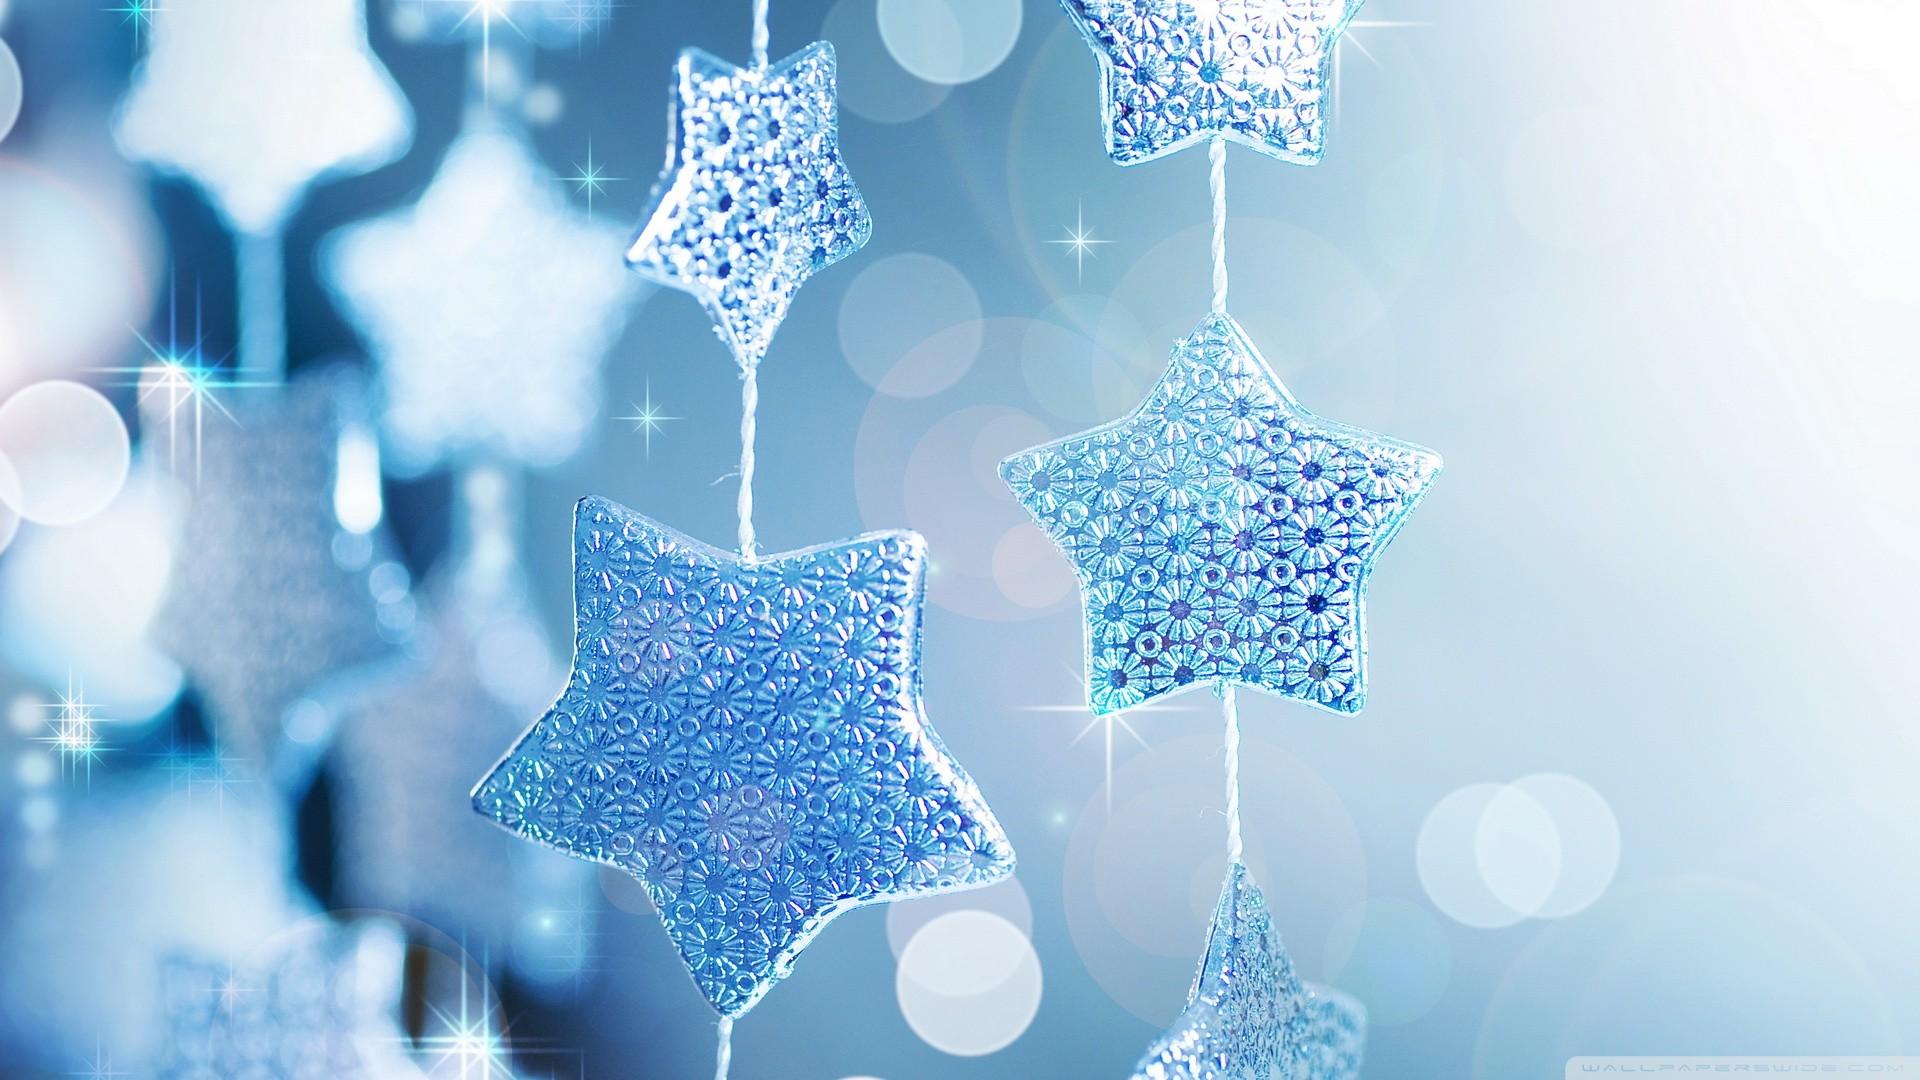 … happy new years day hd desktop wallpaper high definition …